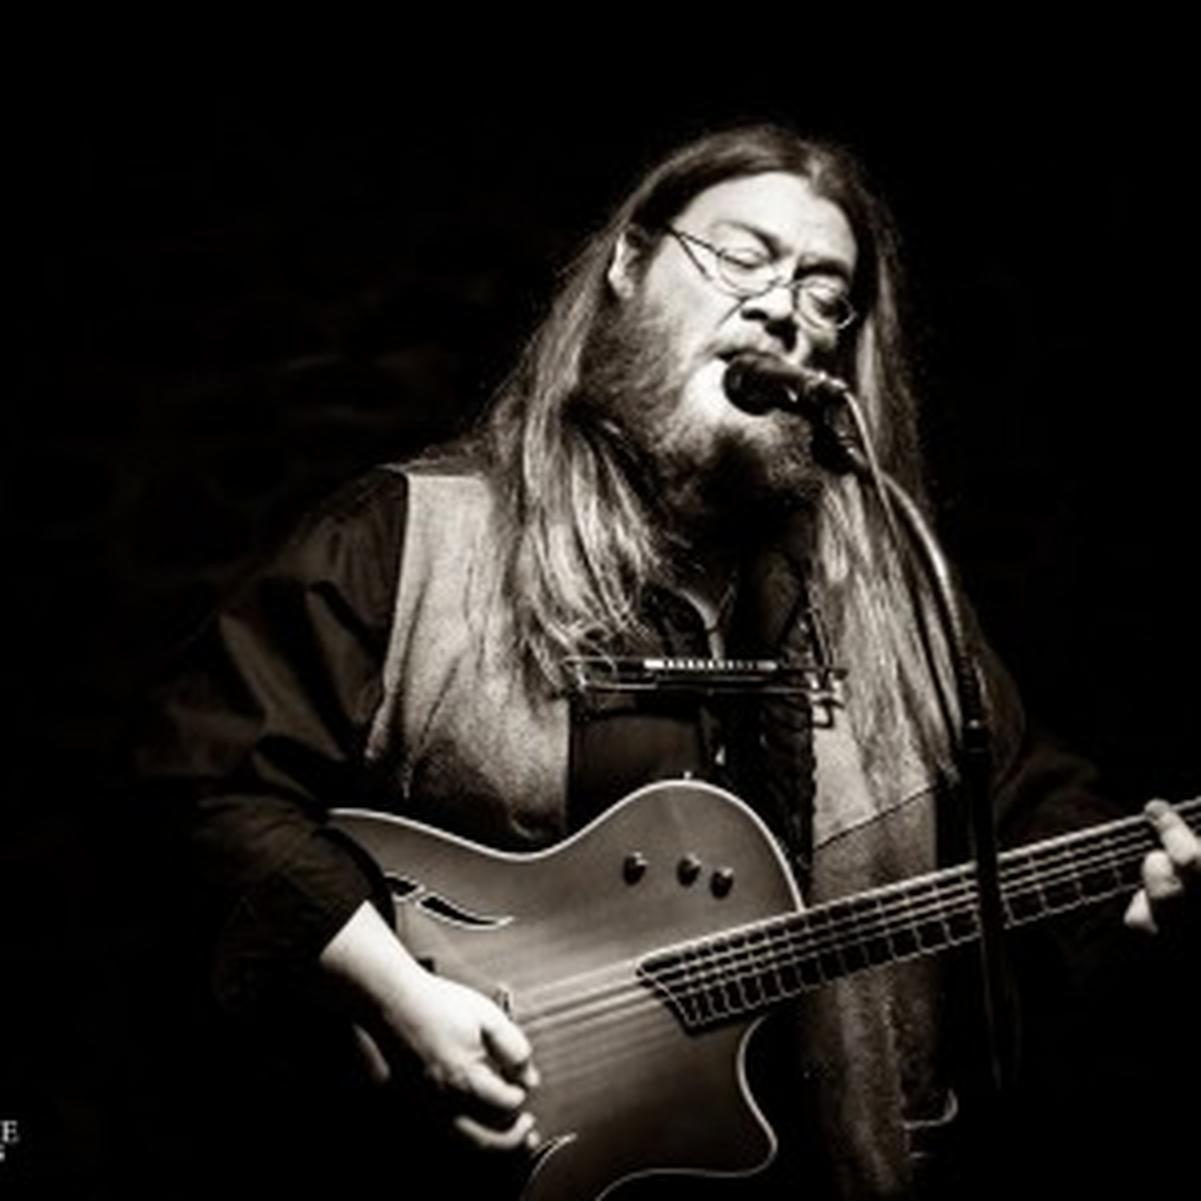 Scott Kirby/ apple love music